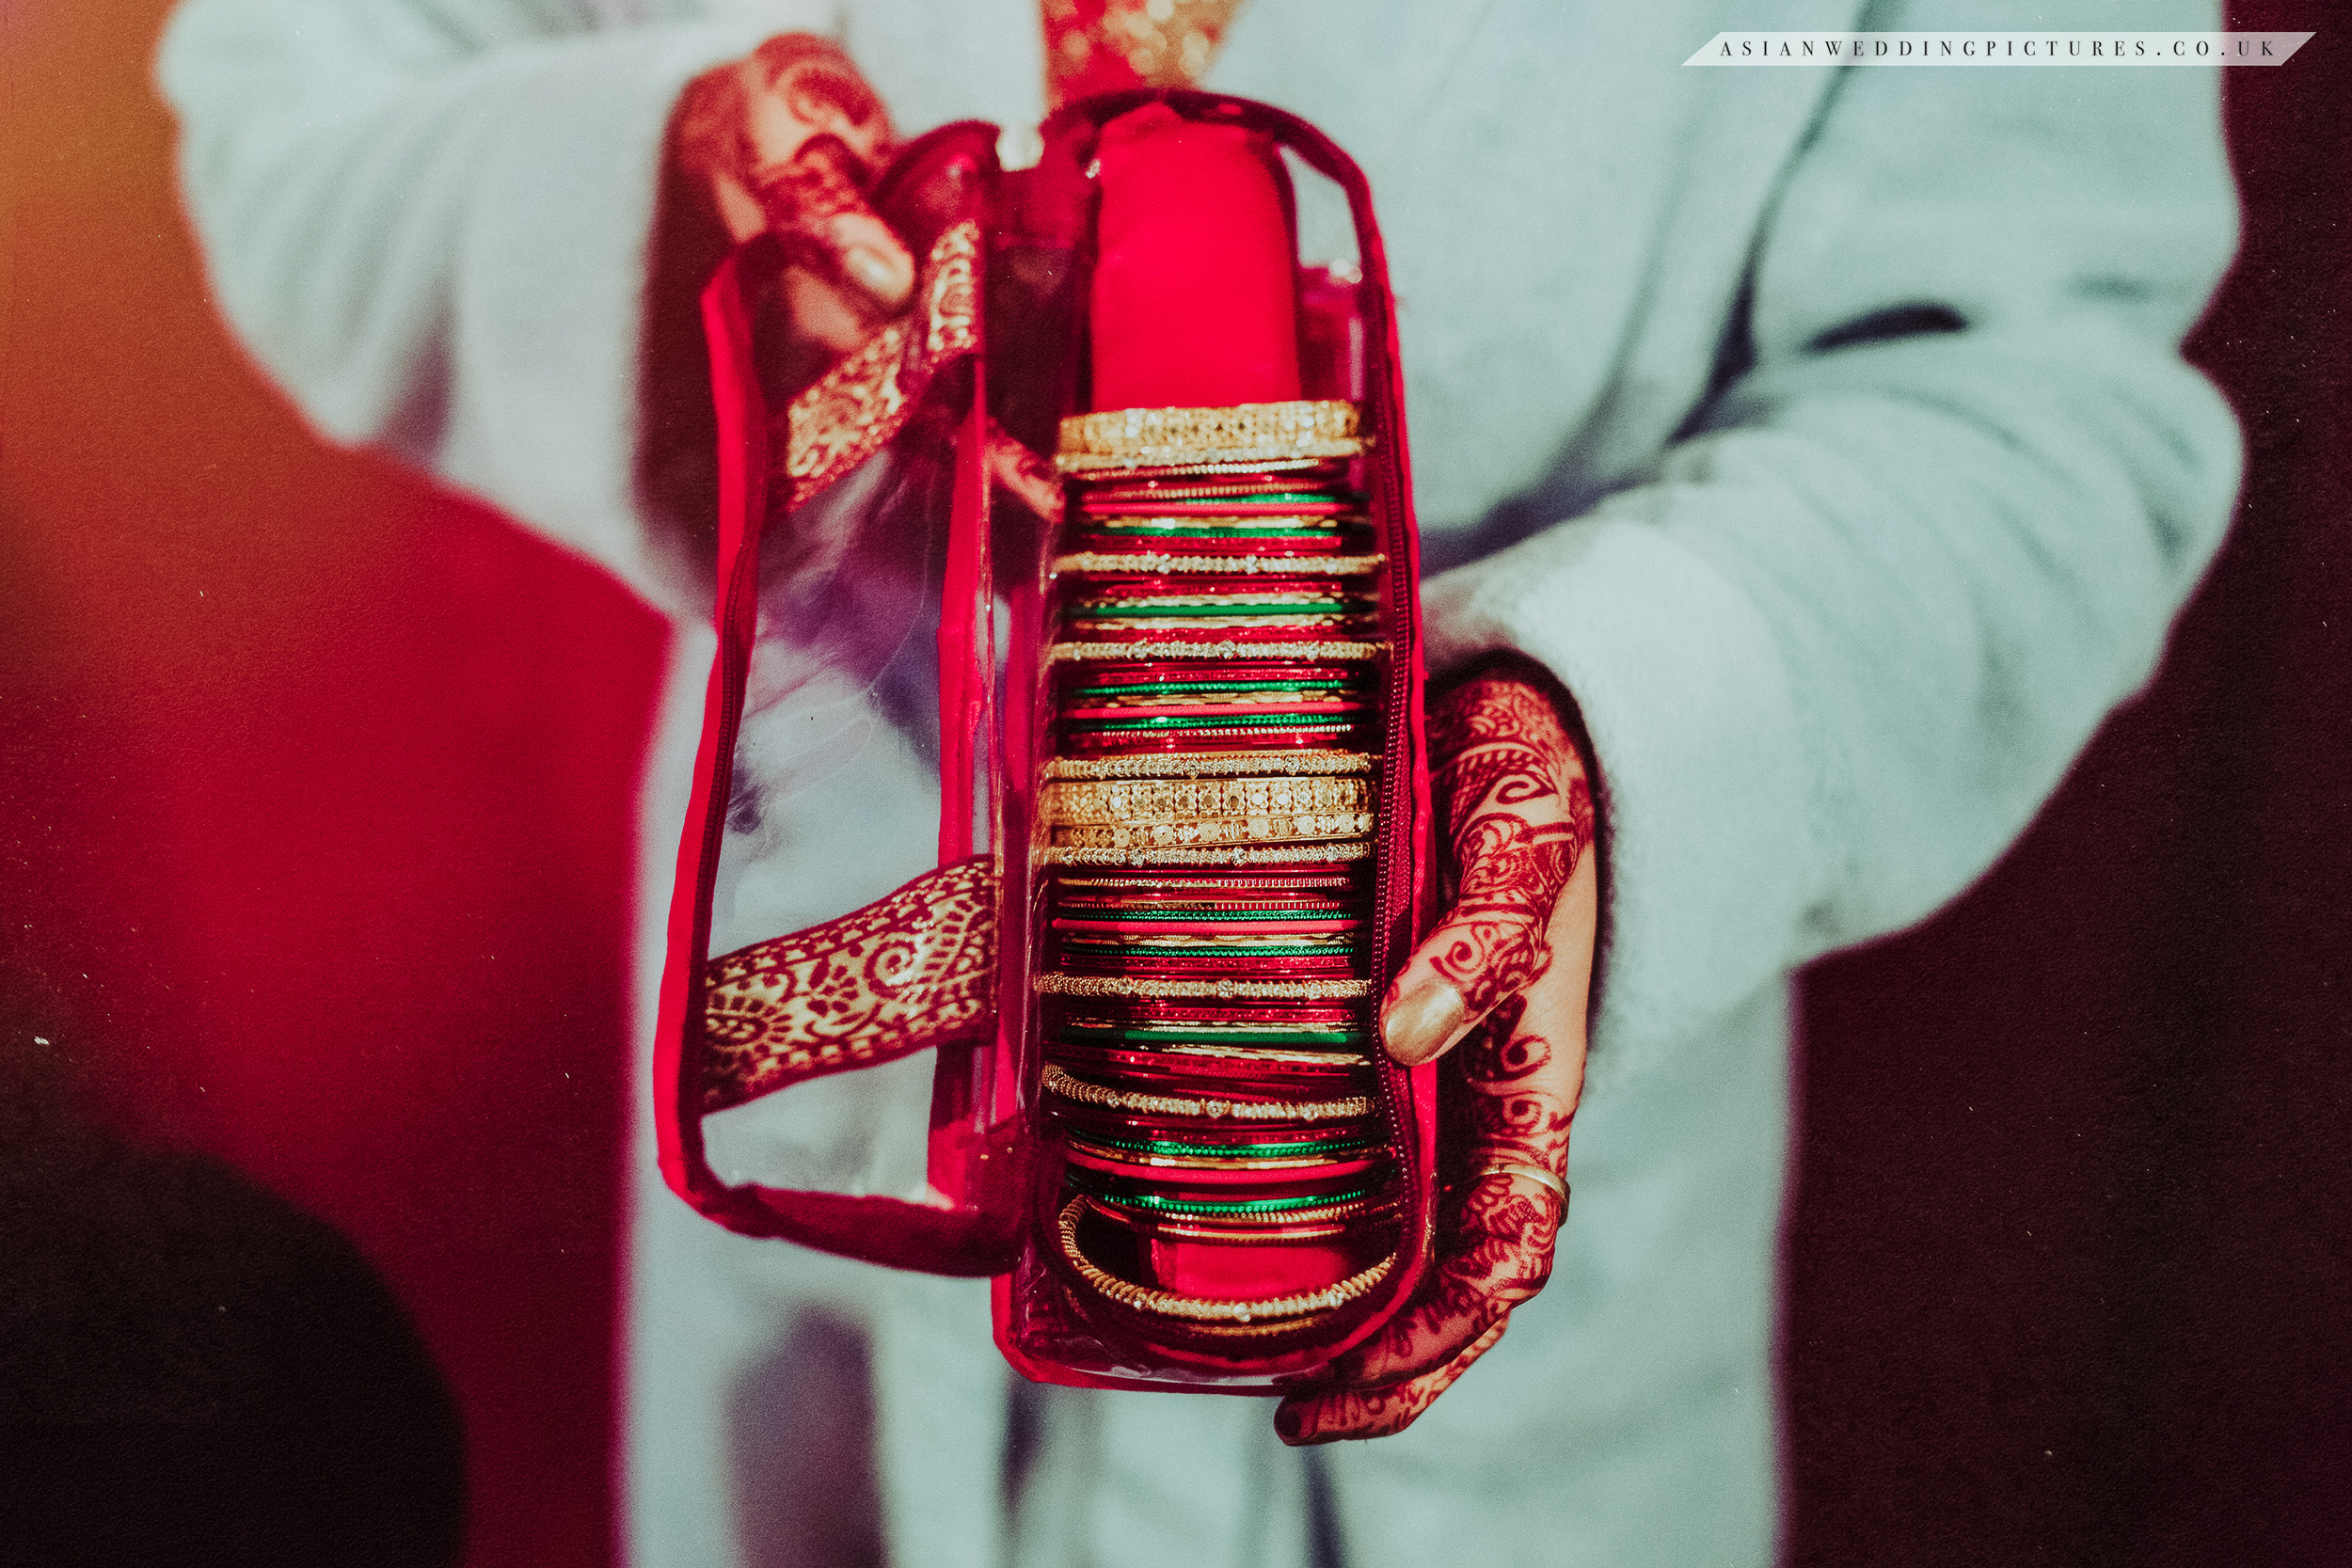 Asian-wedding-photography-2.jpg